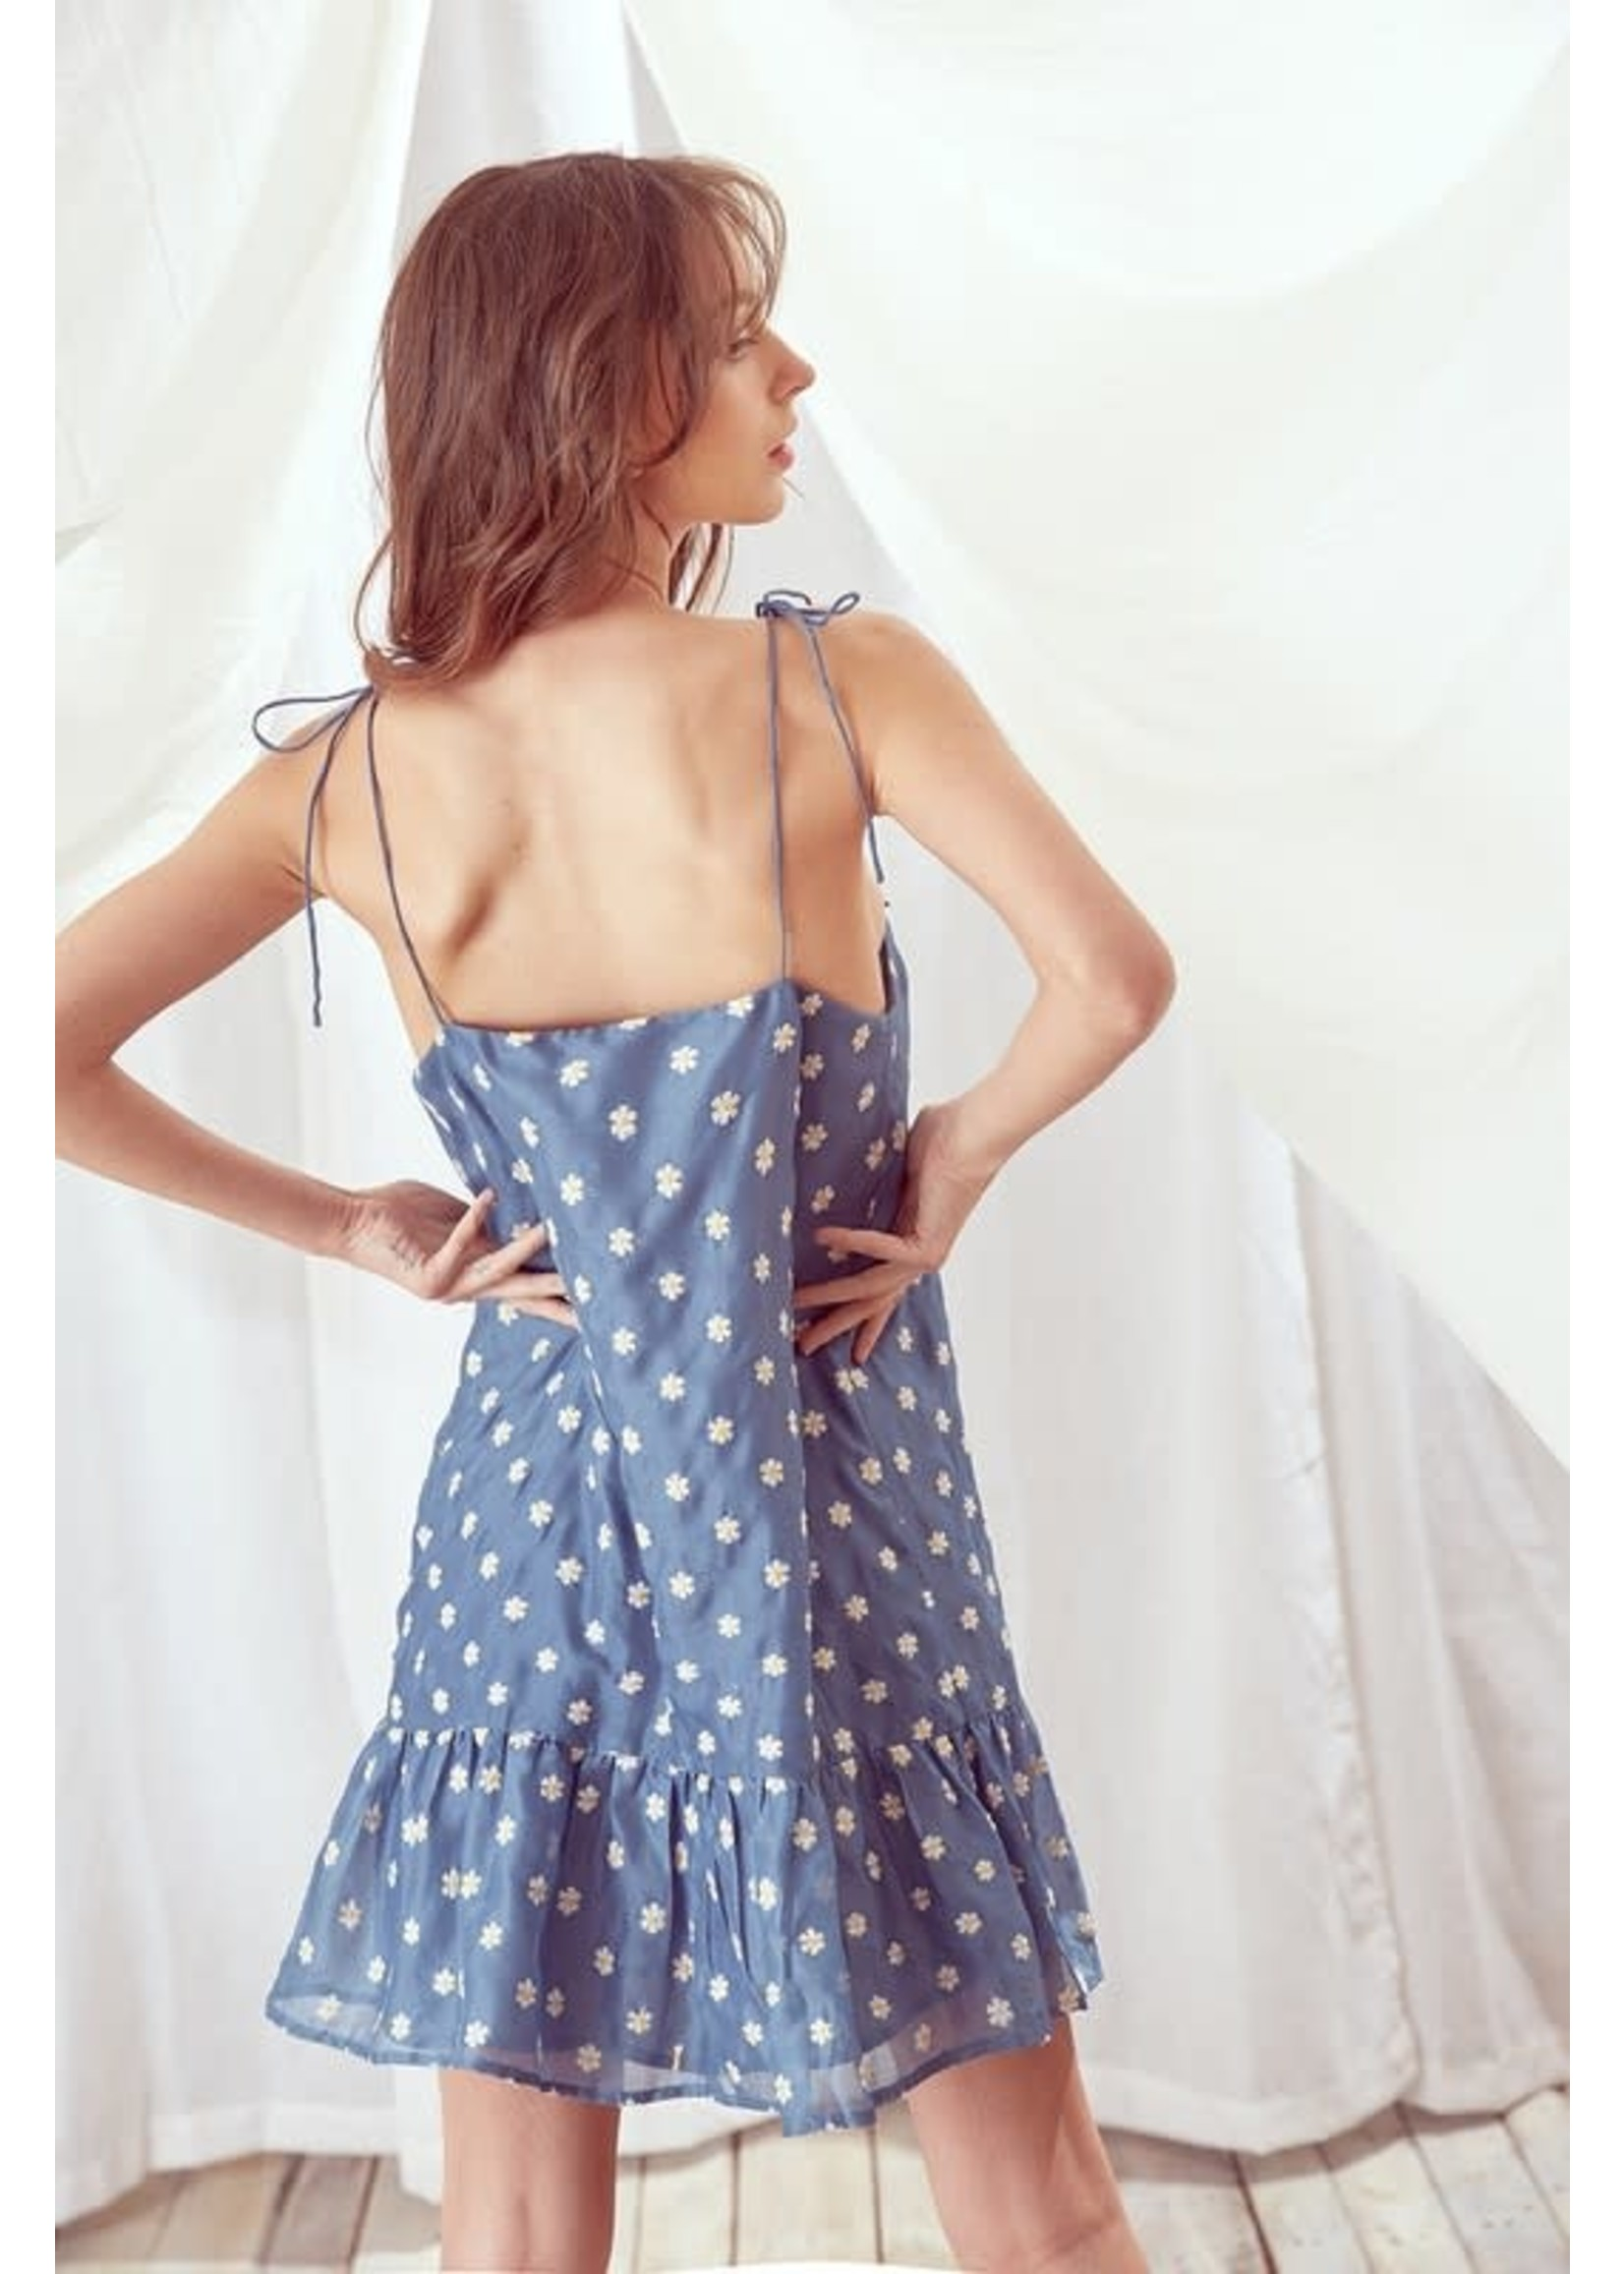 Storia Embroidered Daisy Mini Dress - JD3205